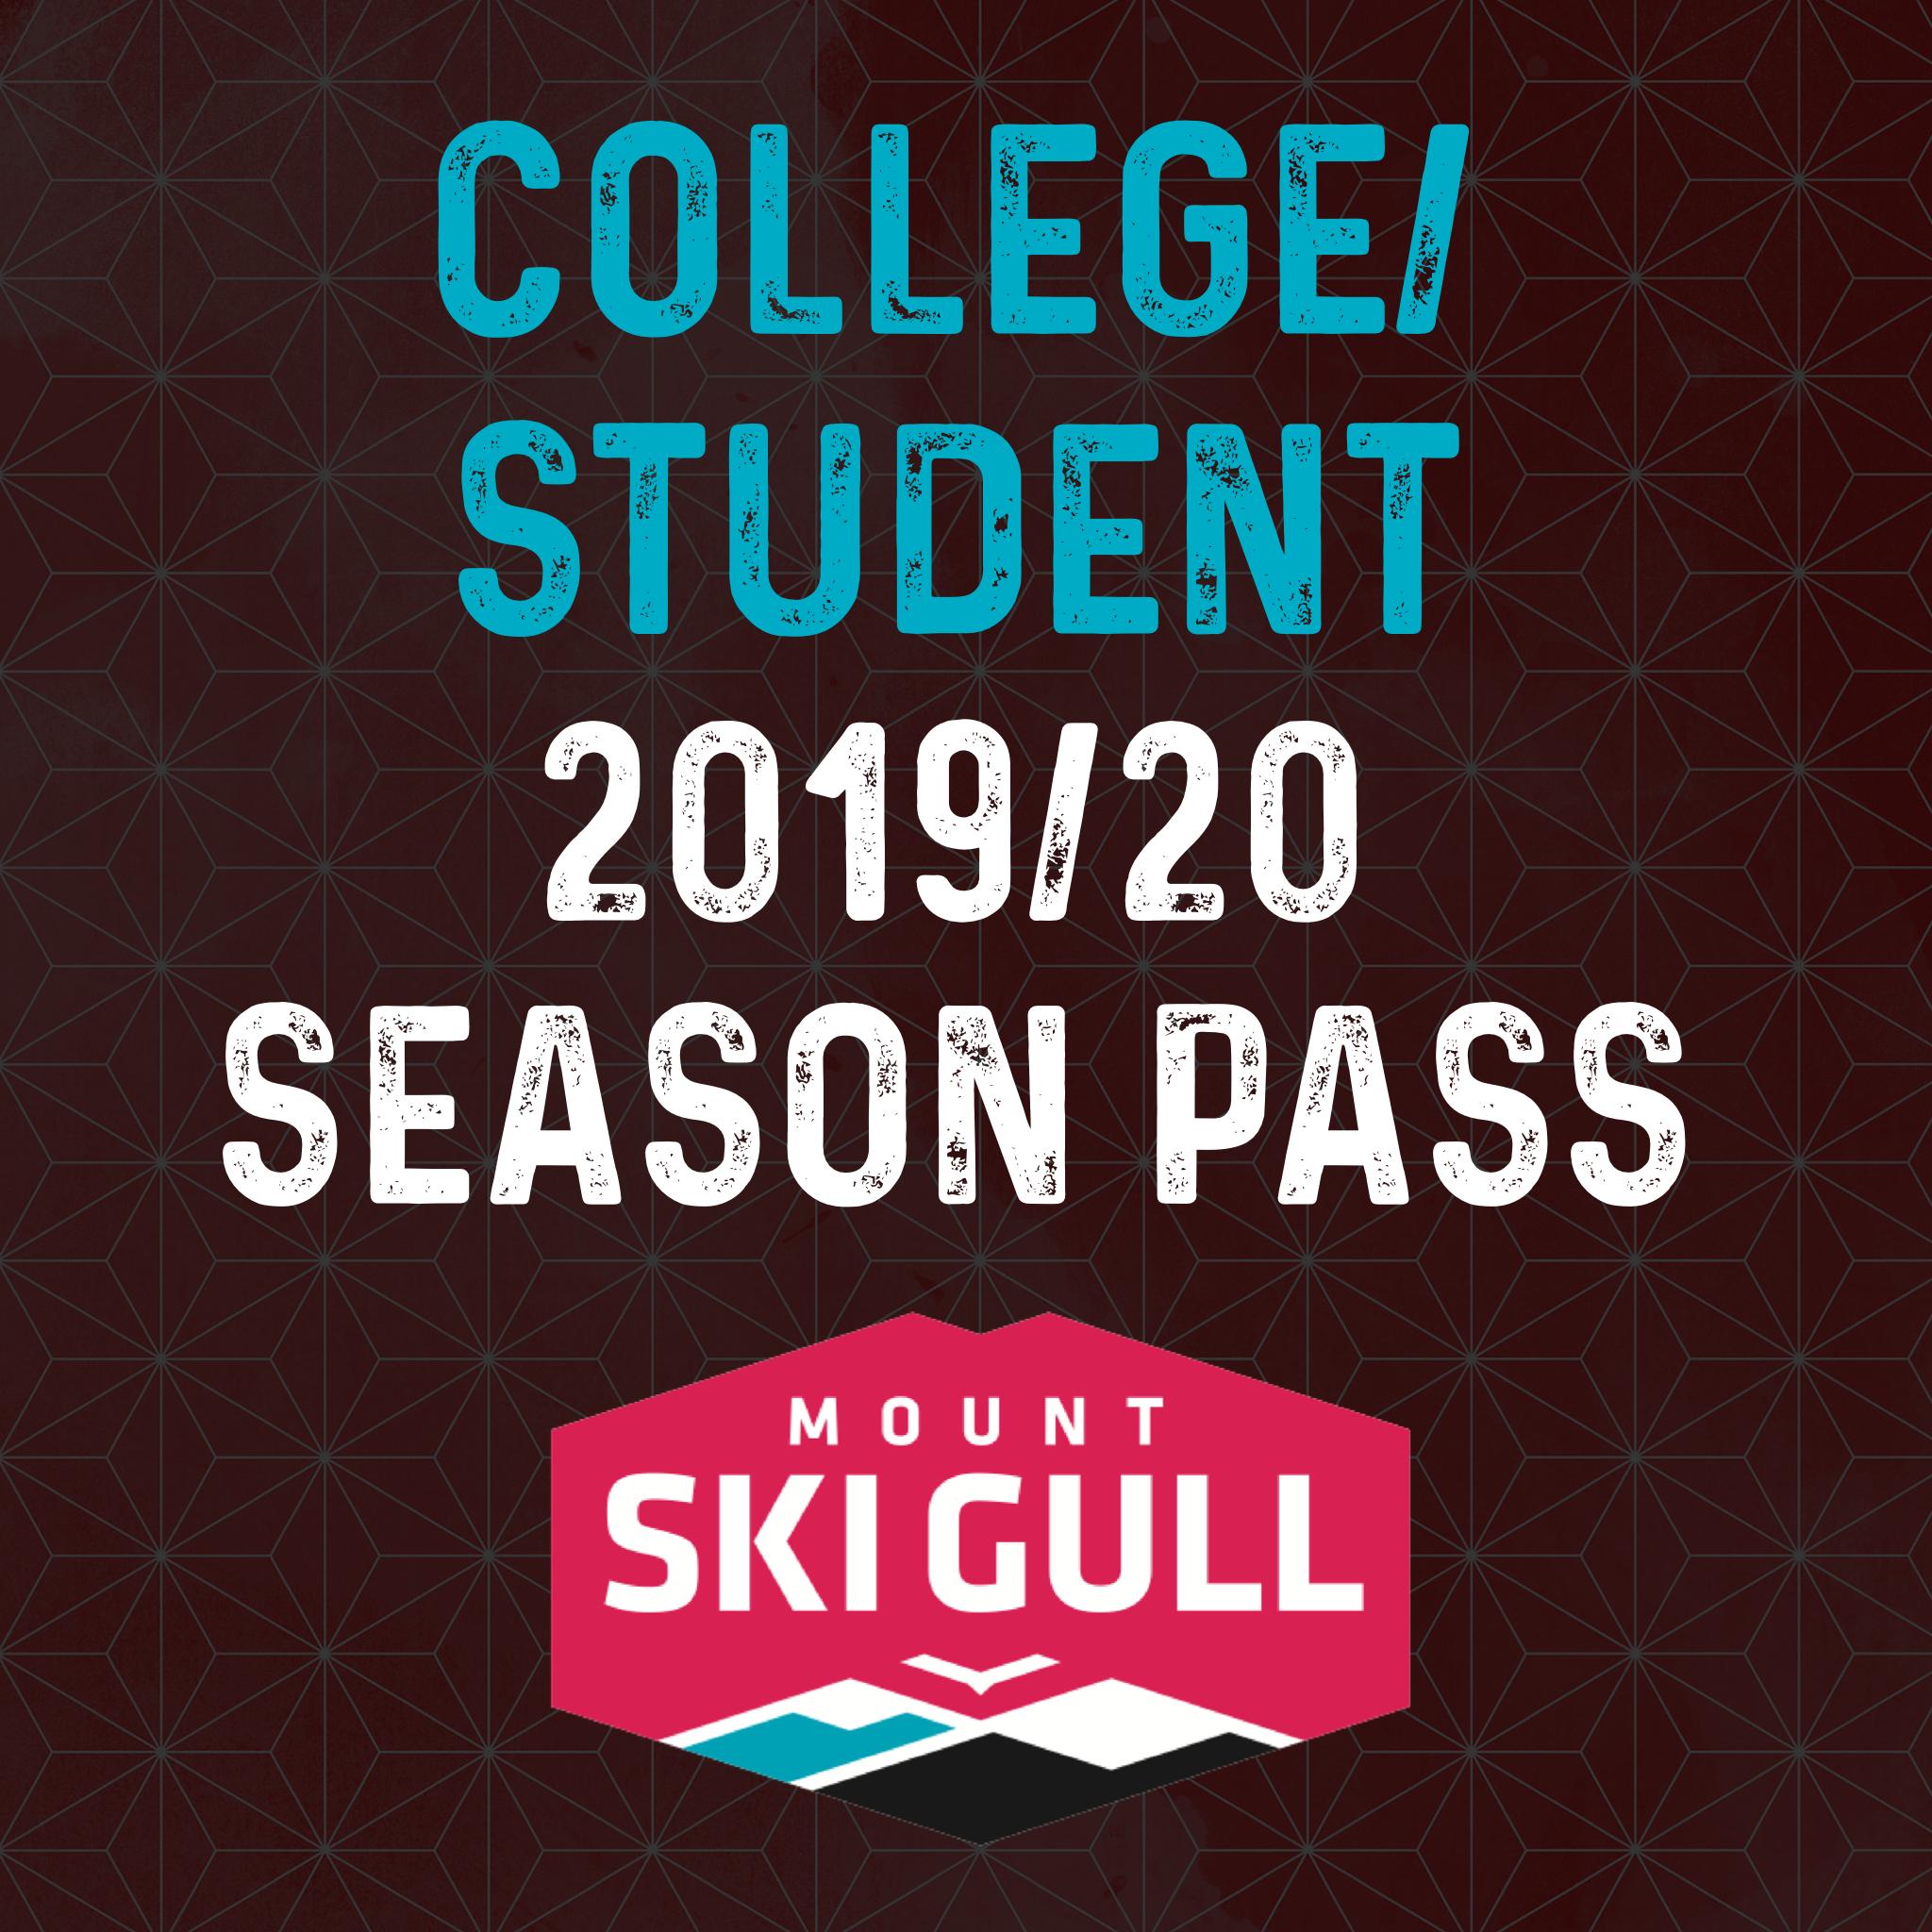 2019 - 2020 College/Student Pass